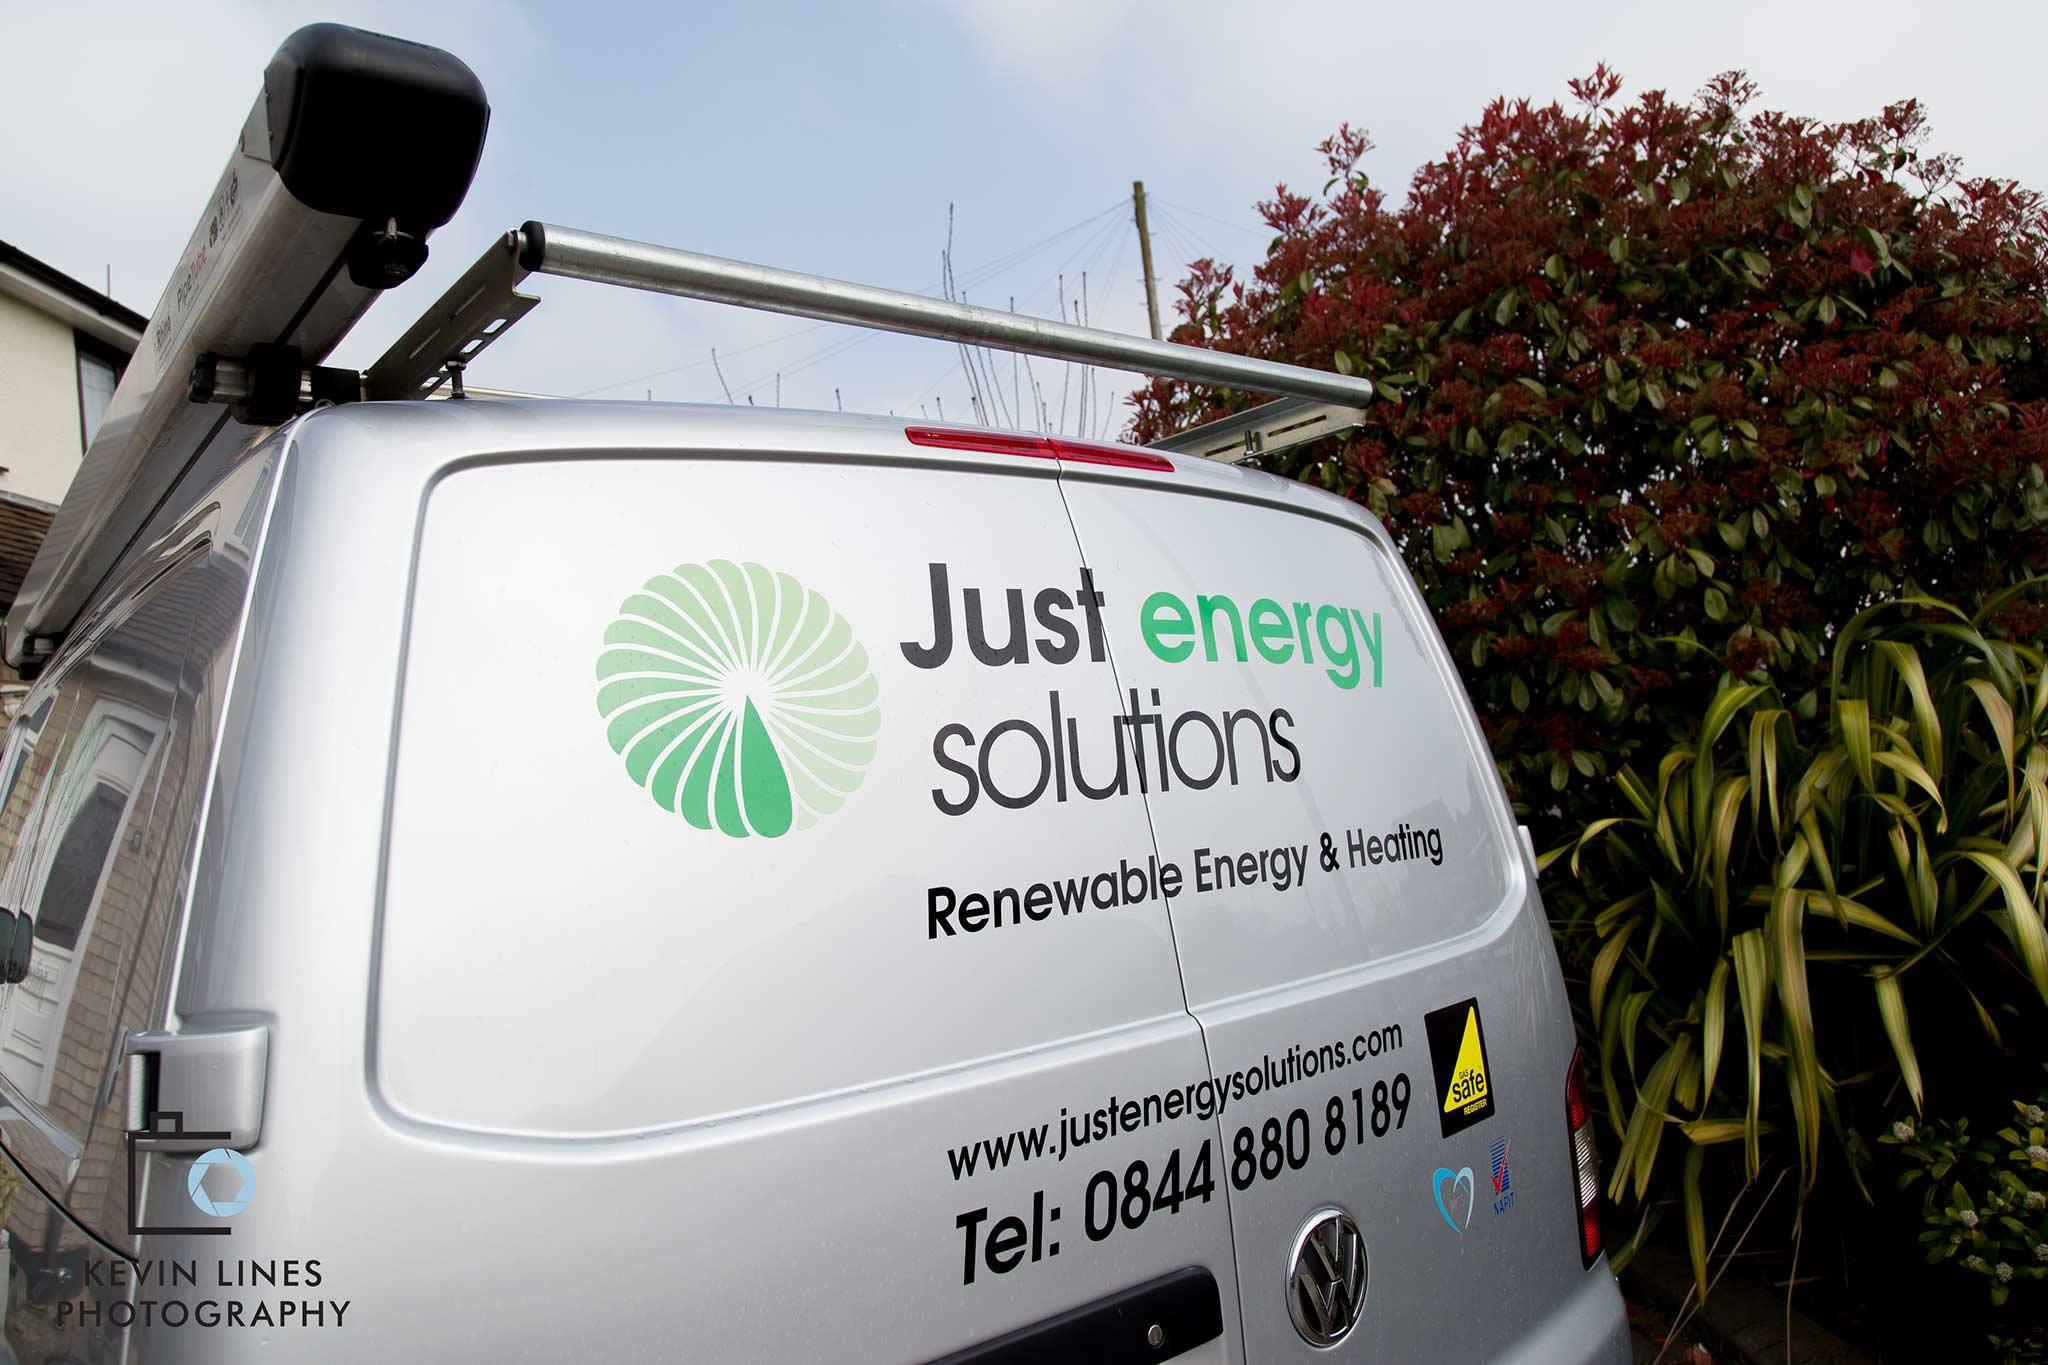 just-energy-solutions-55.jpg